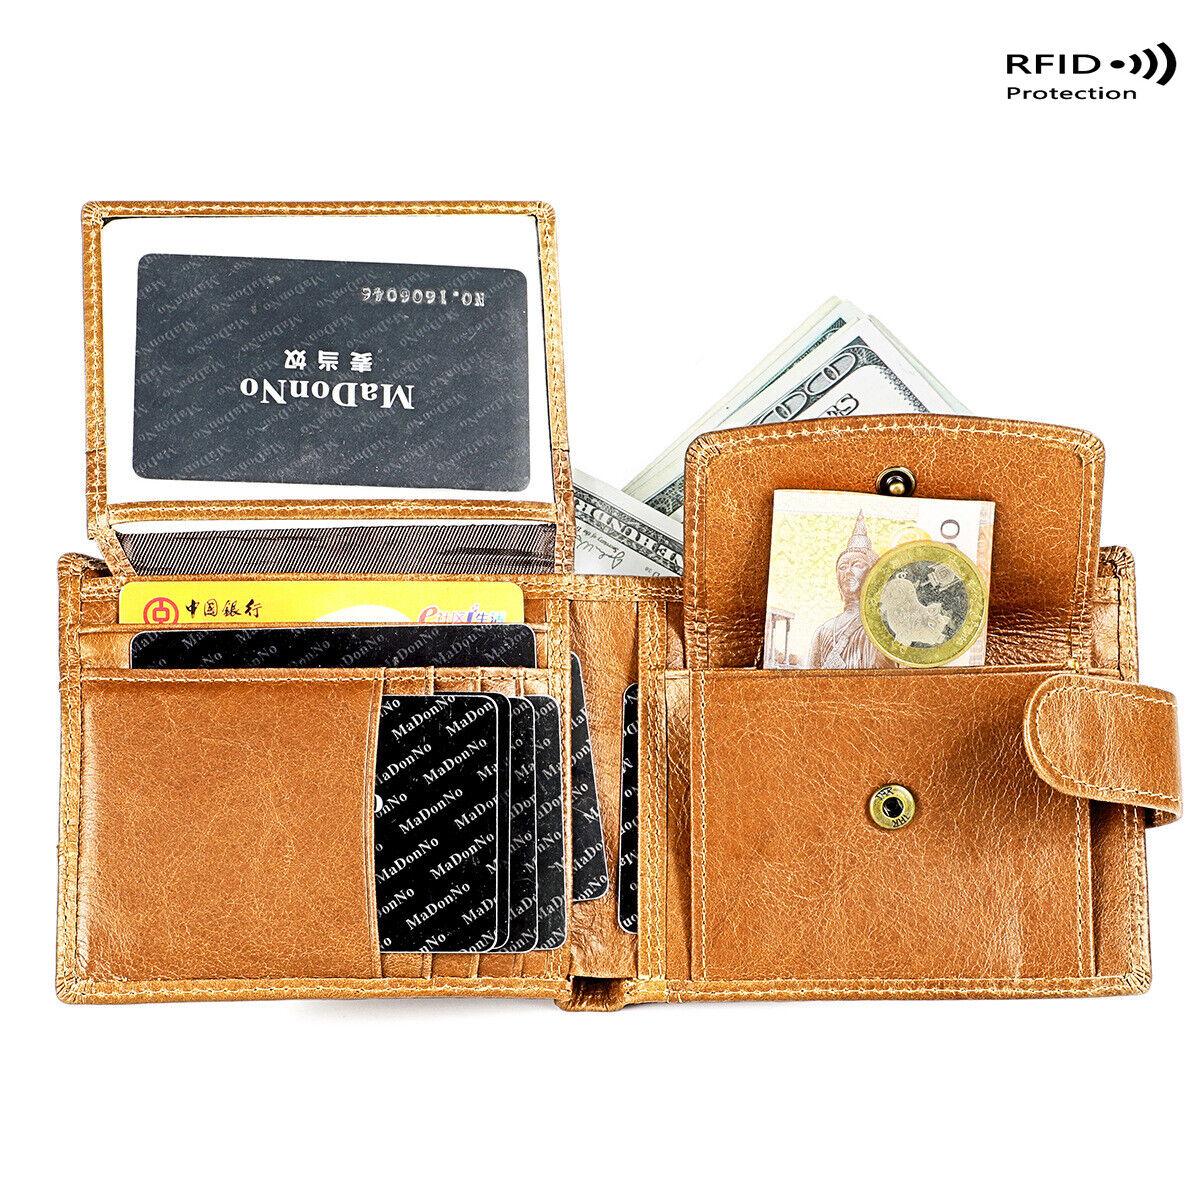 100% Genuine Leather Men's Bifold Wallet RFID Blocking ID Card Holder Coin Purse